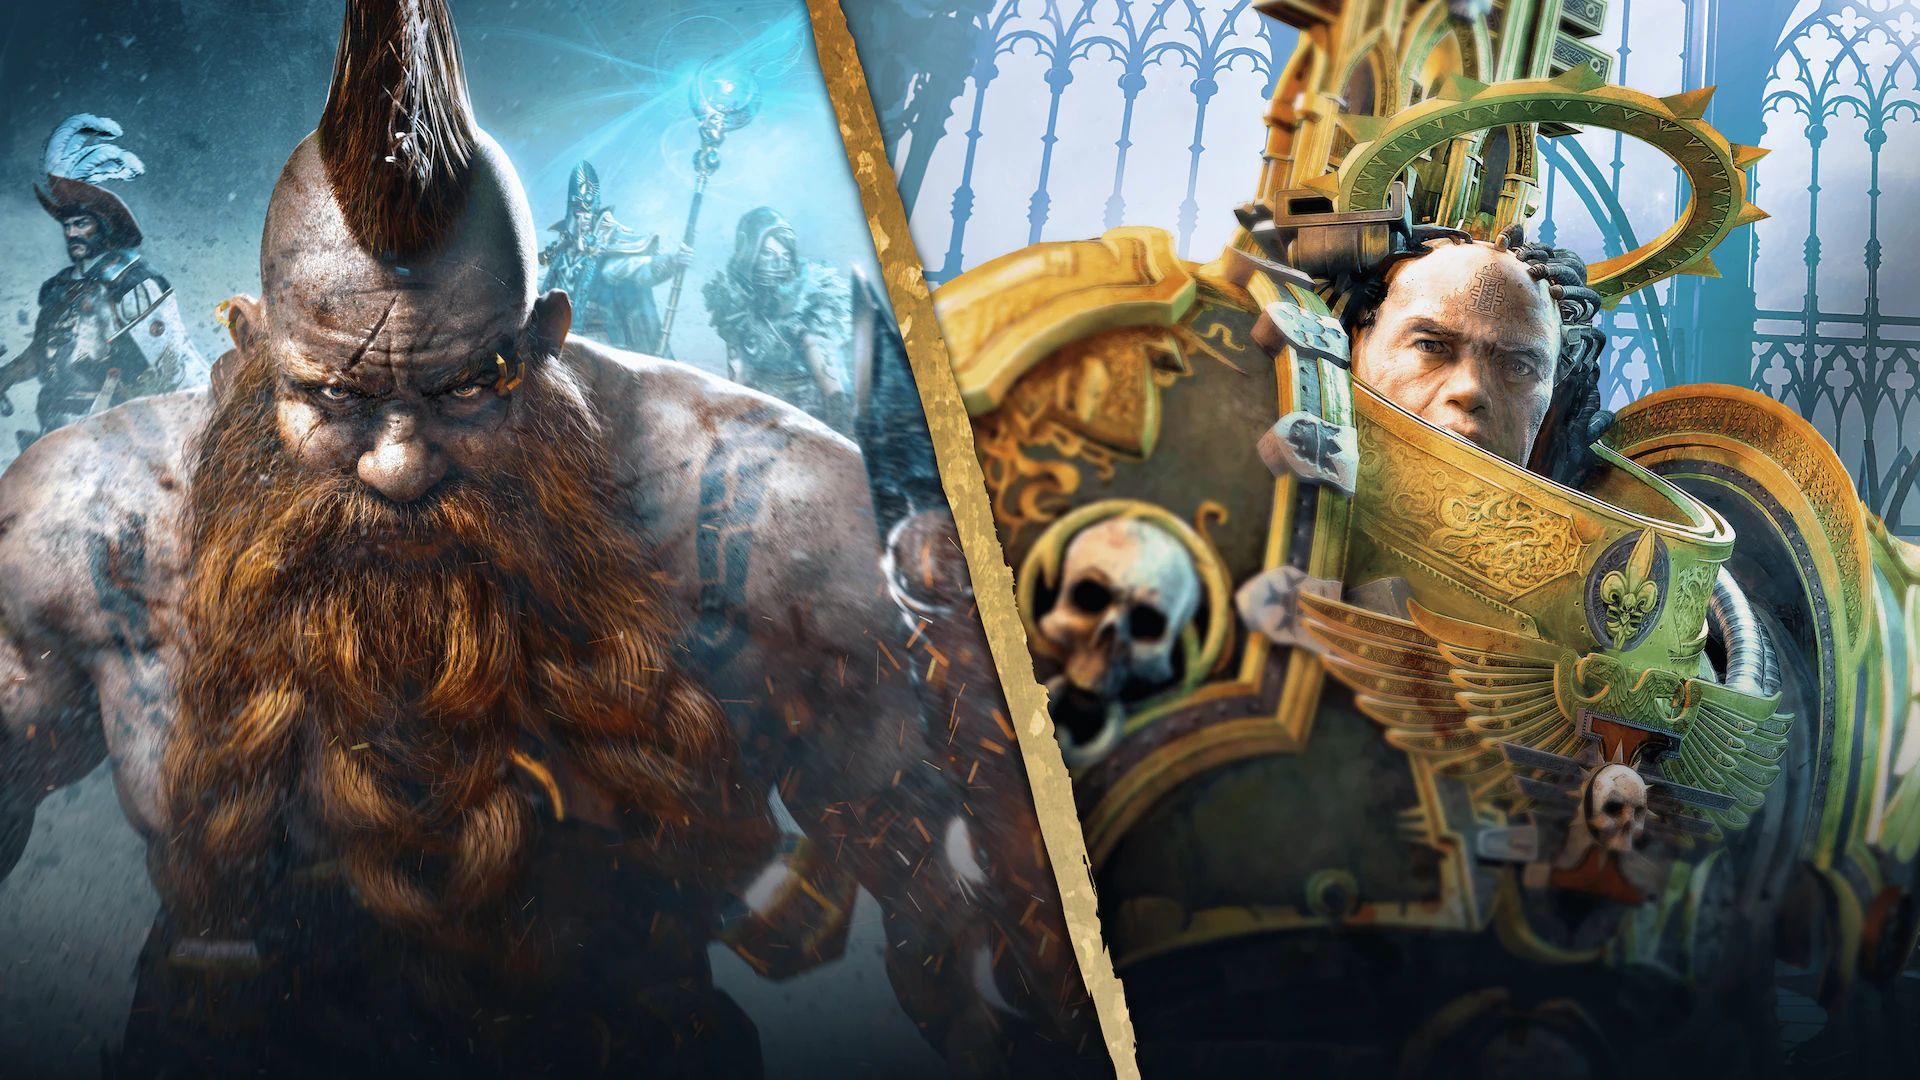 Playstation Store   Warhammer Pack: Hack and Slash (40,000: Inquisitor u. Chaosbane) PS4// Warhammer: Chaosbane Slayer Edition PS4/PS5